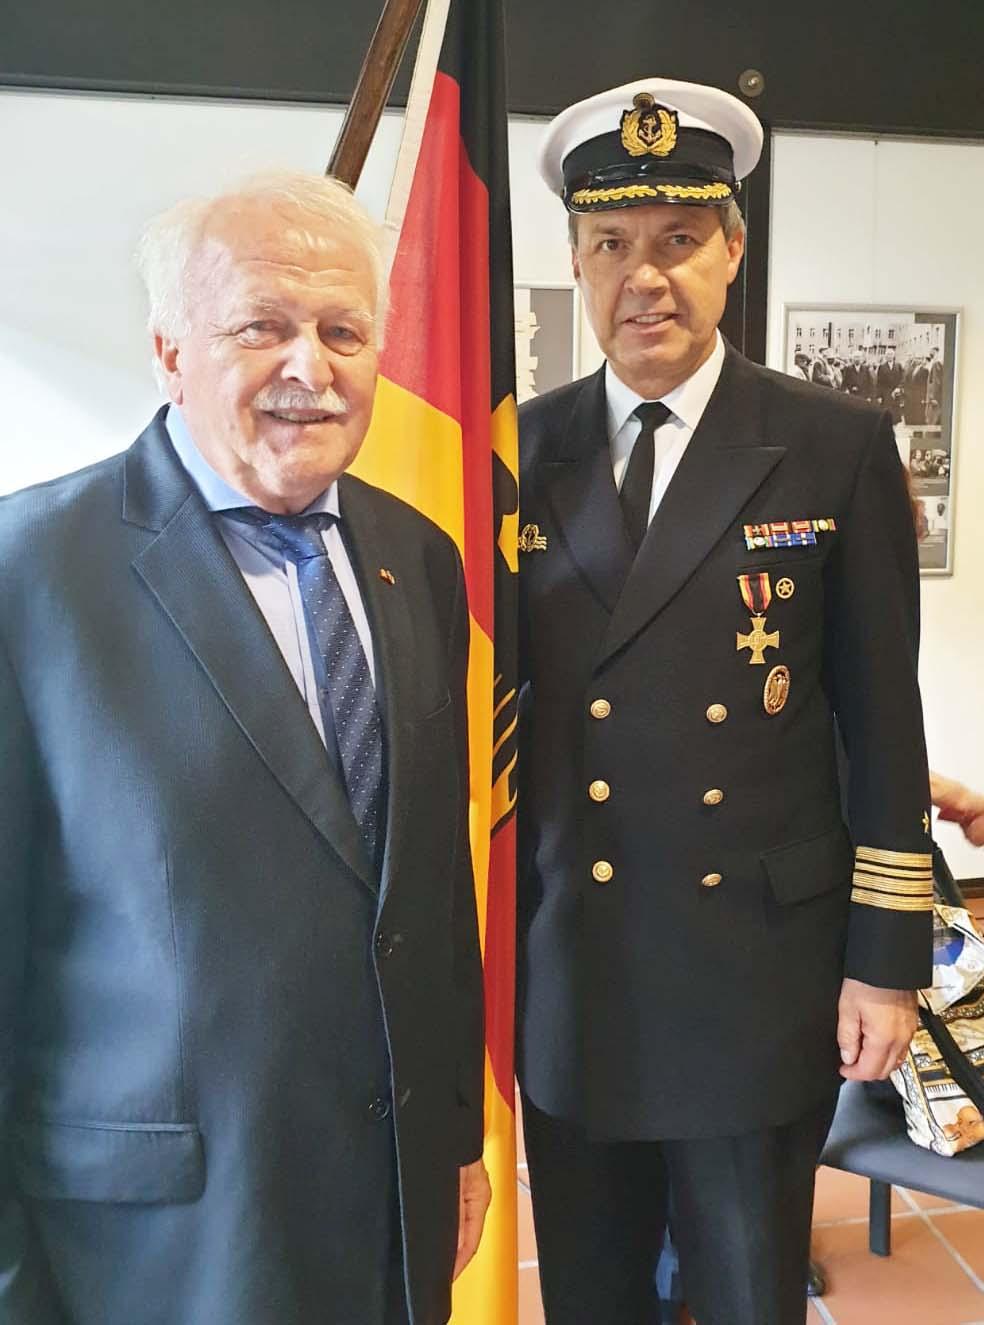 2019-10-1-privat- Fregattenkapitän Michael Meding IMG-20190930-WA0000.1